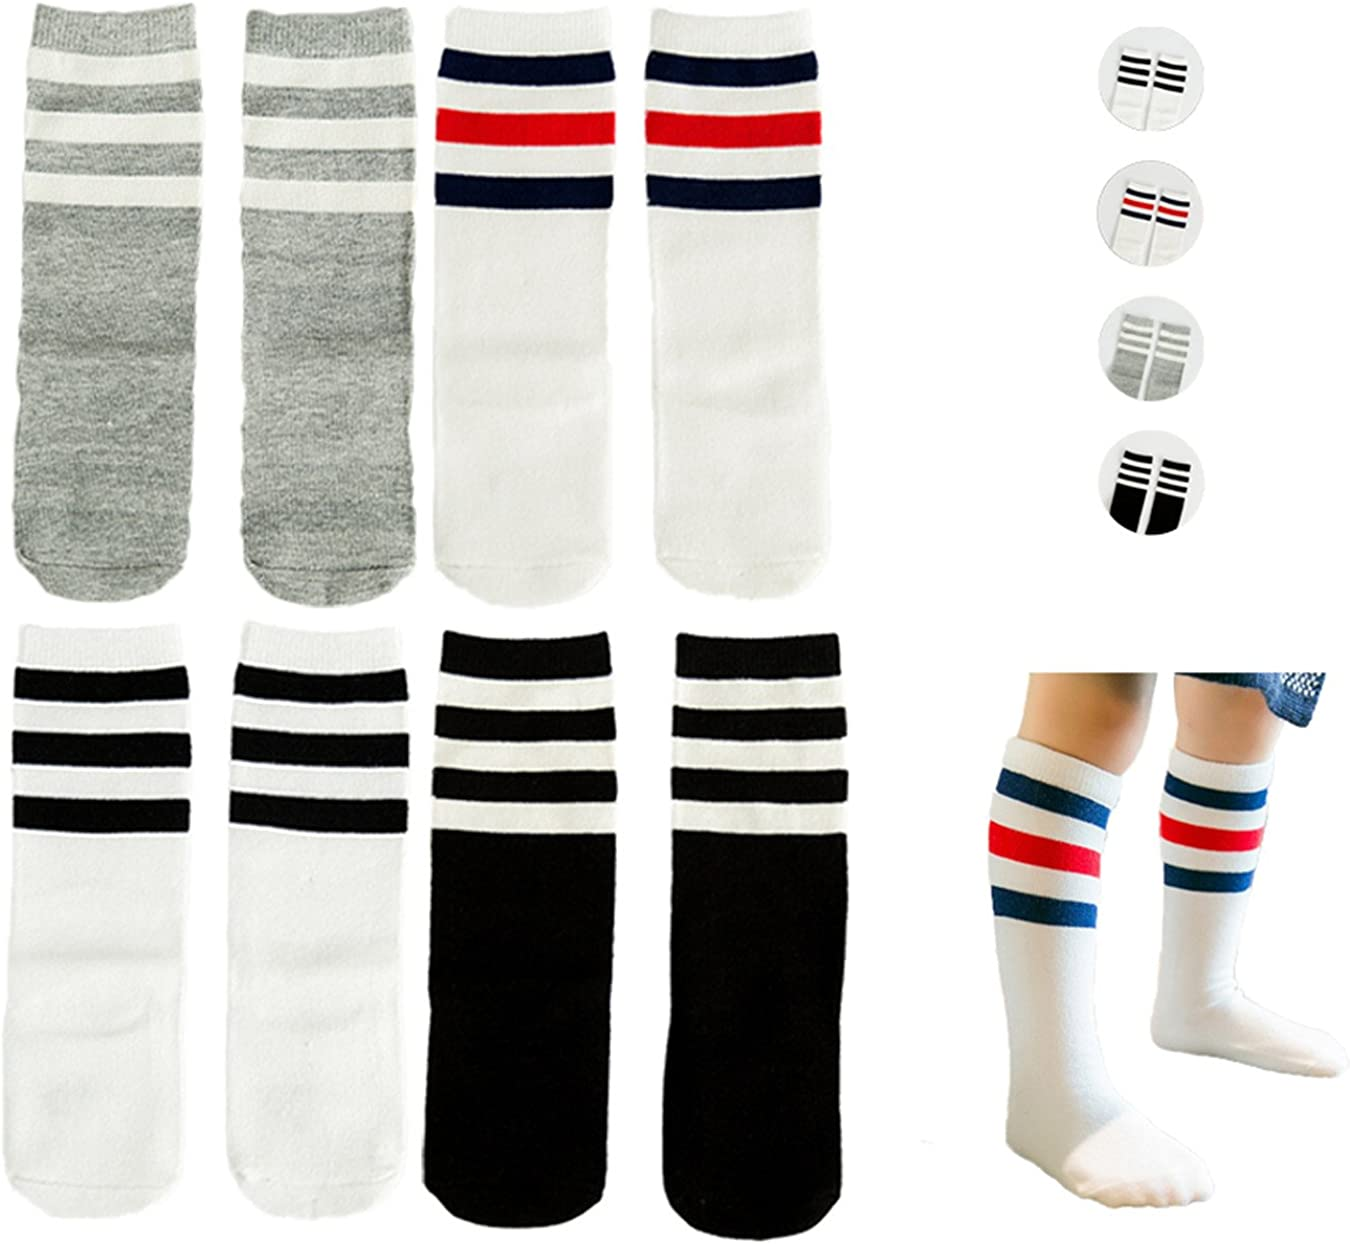 Fashion Baby Leg Warmers Bowknot Striped Cotton Socks Knee Length Stockings L